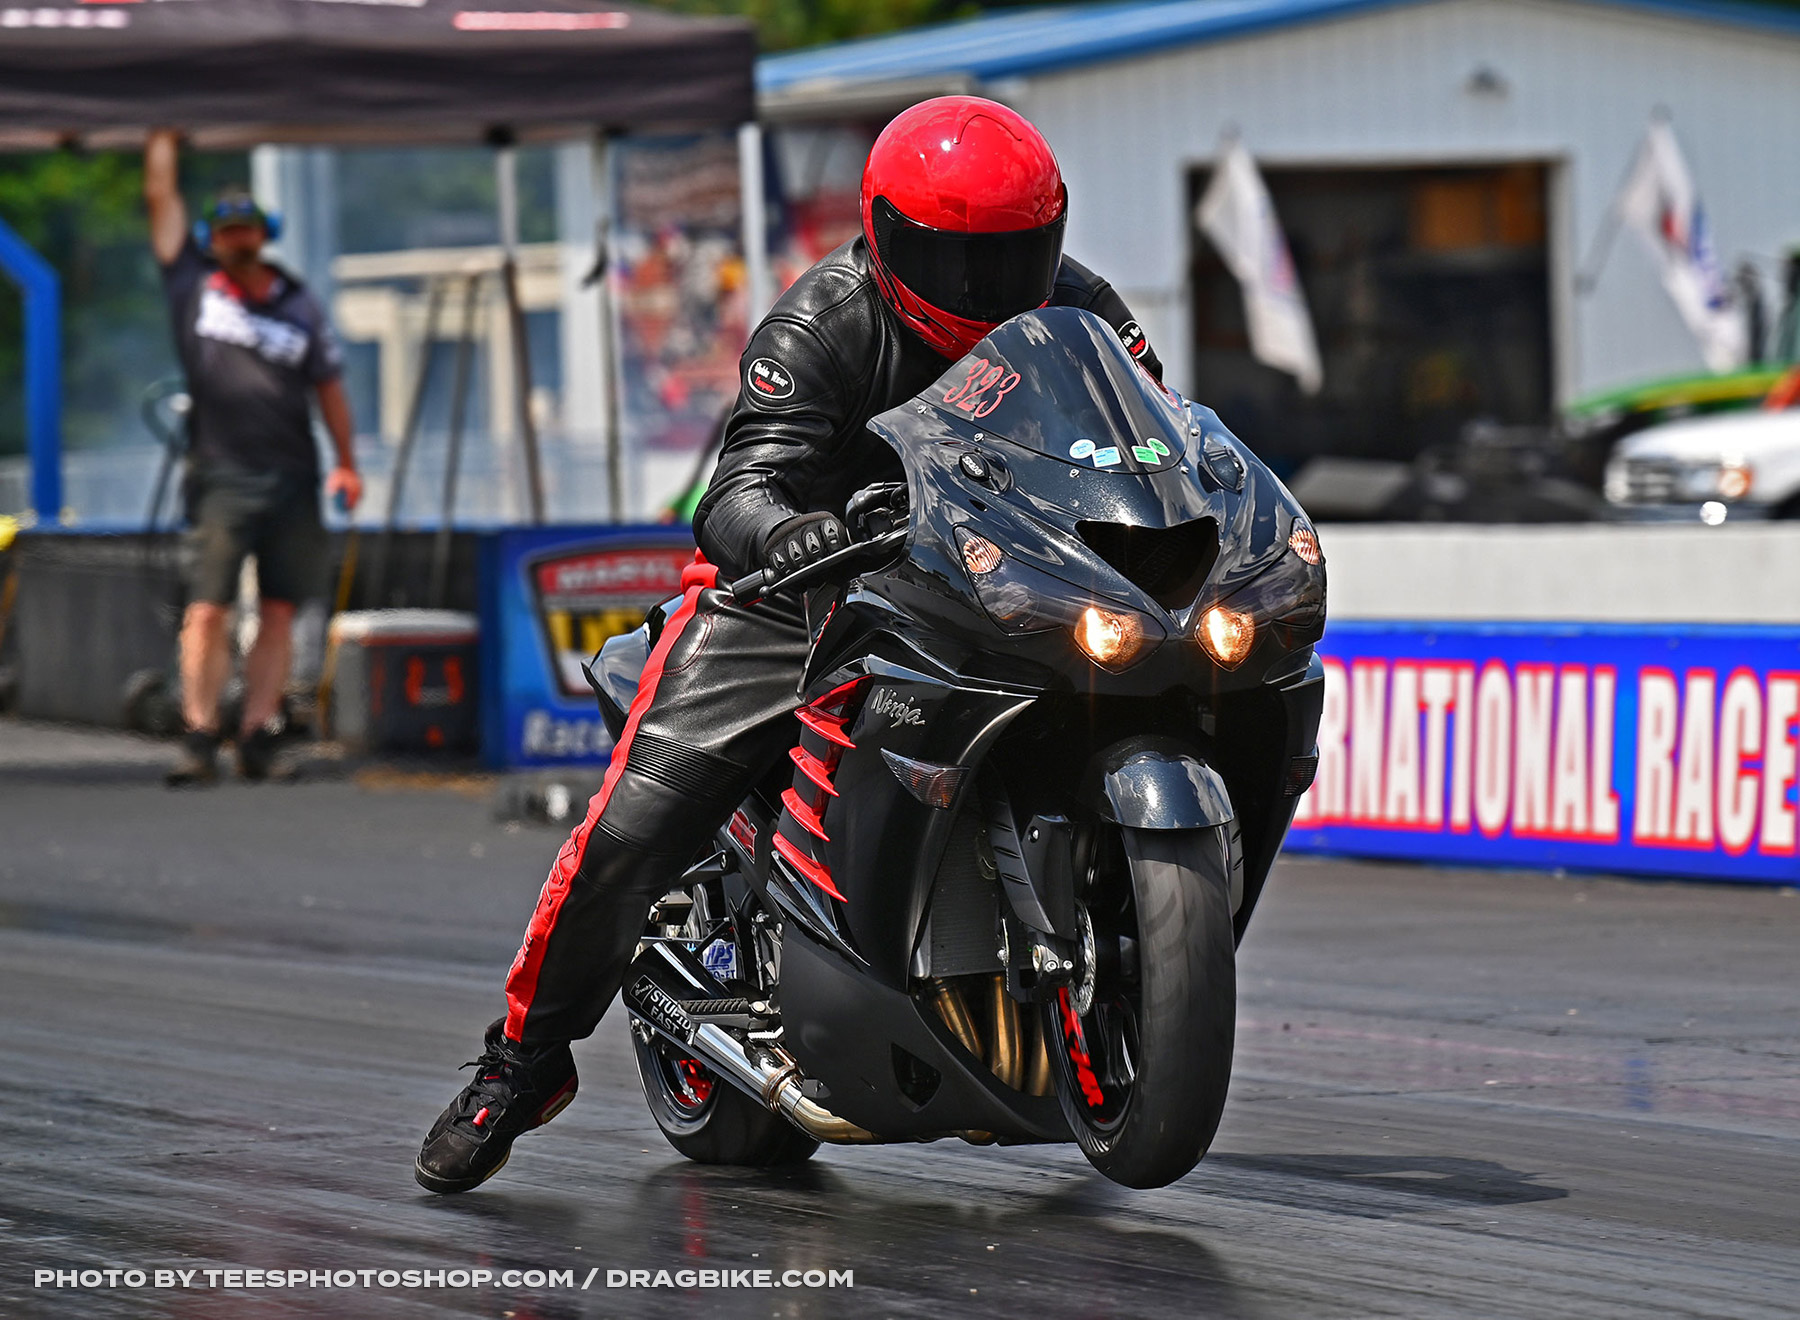 Francis Proctor Jr - 2020 XDA Motorcycle Drag Racing